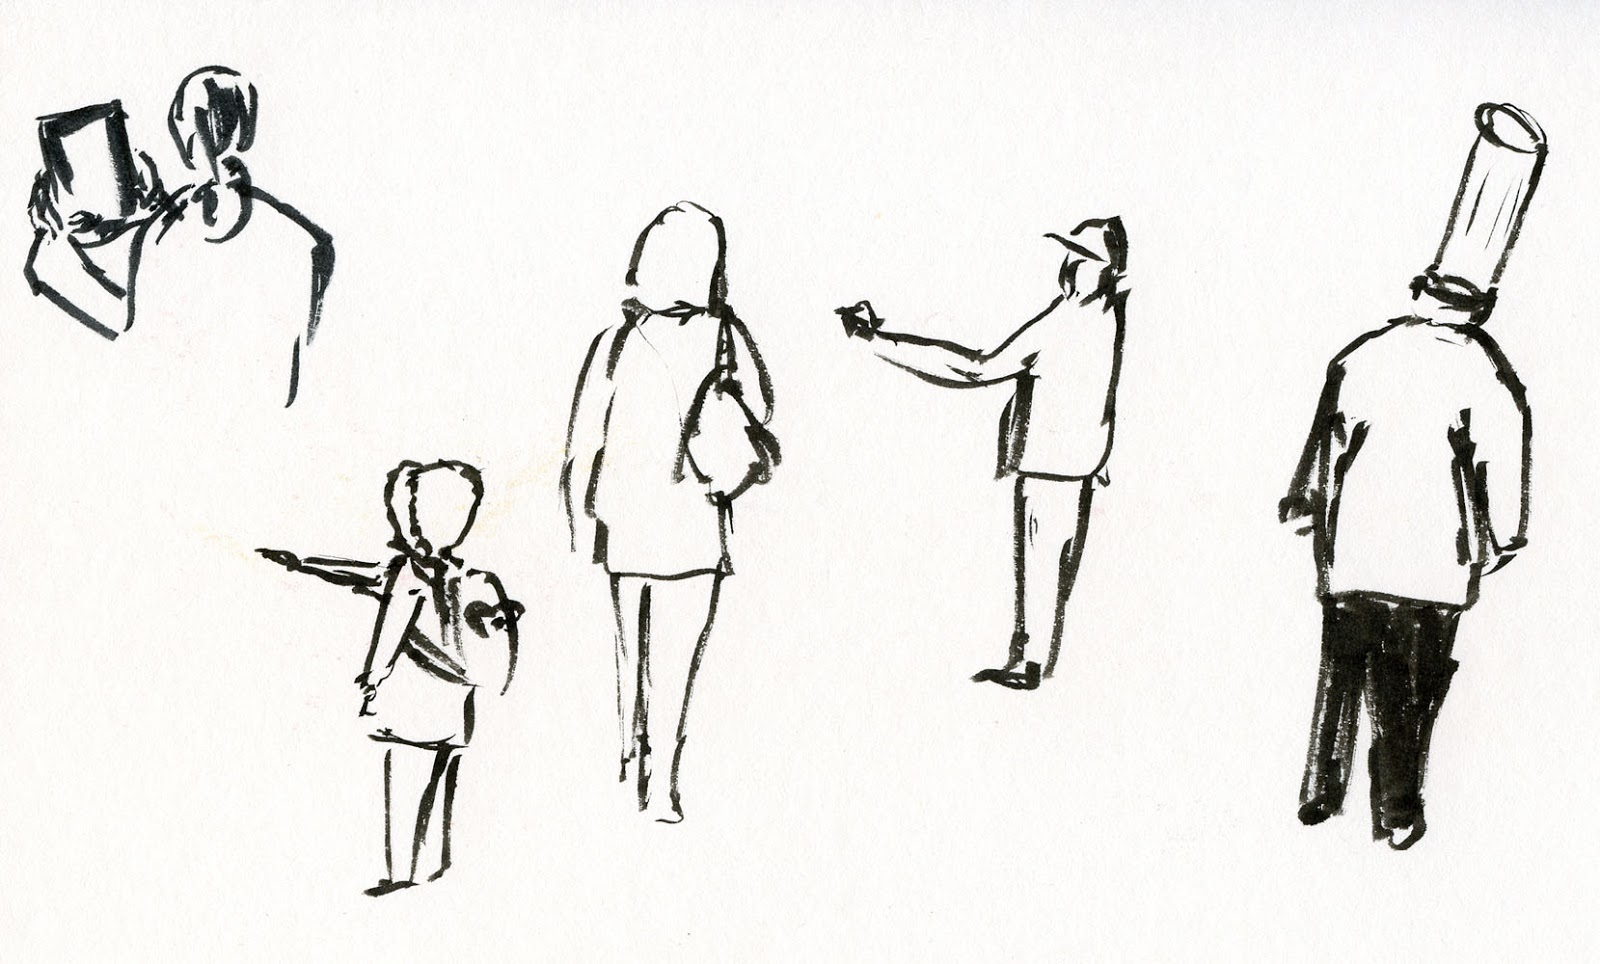 Line Art Village : Line drawing human back clipart best